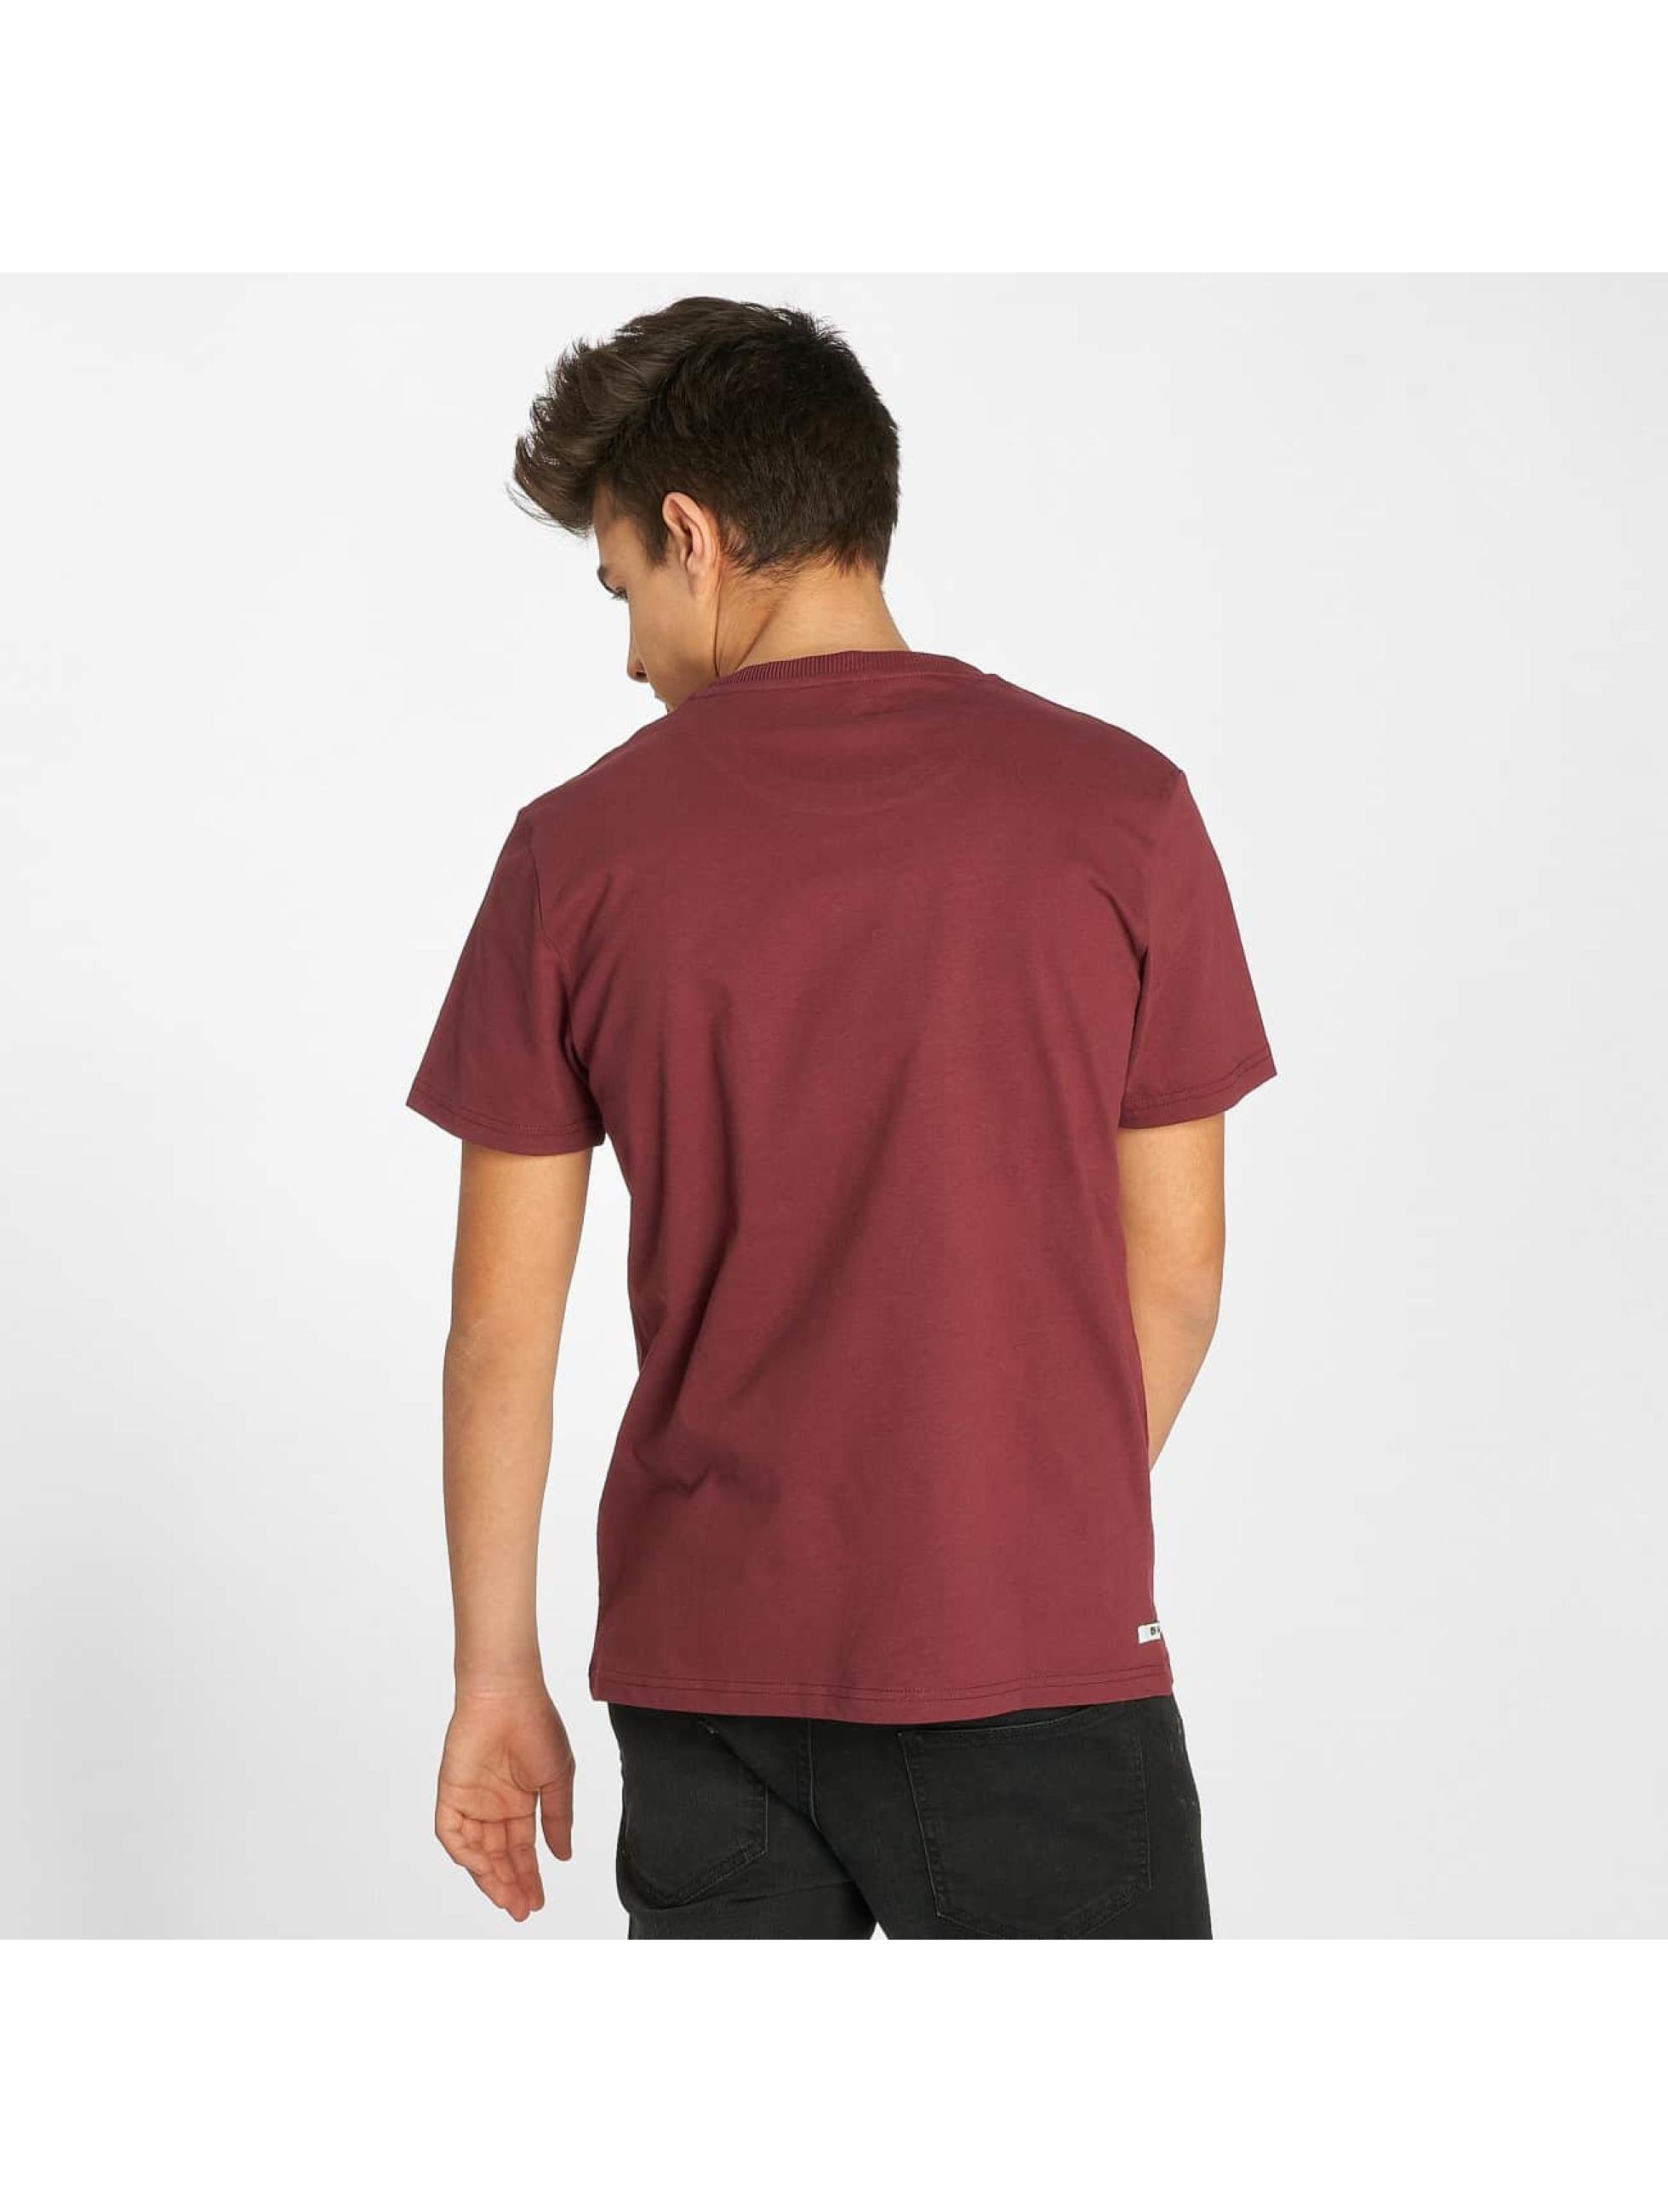 Kulte t-shirt Corpo rood